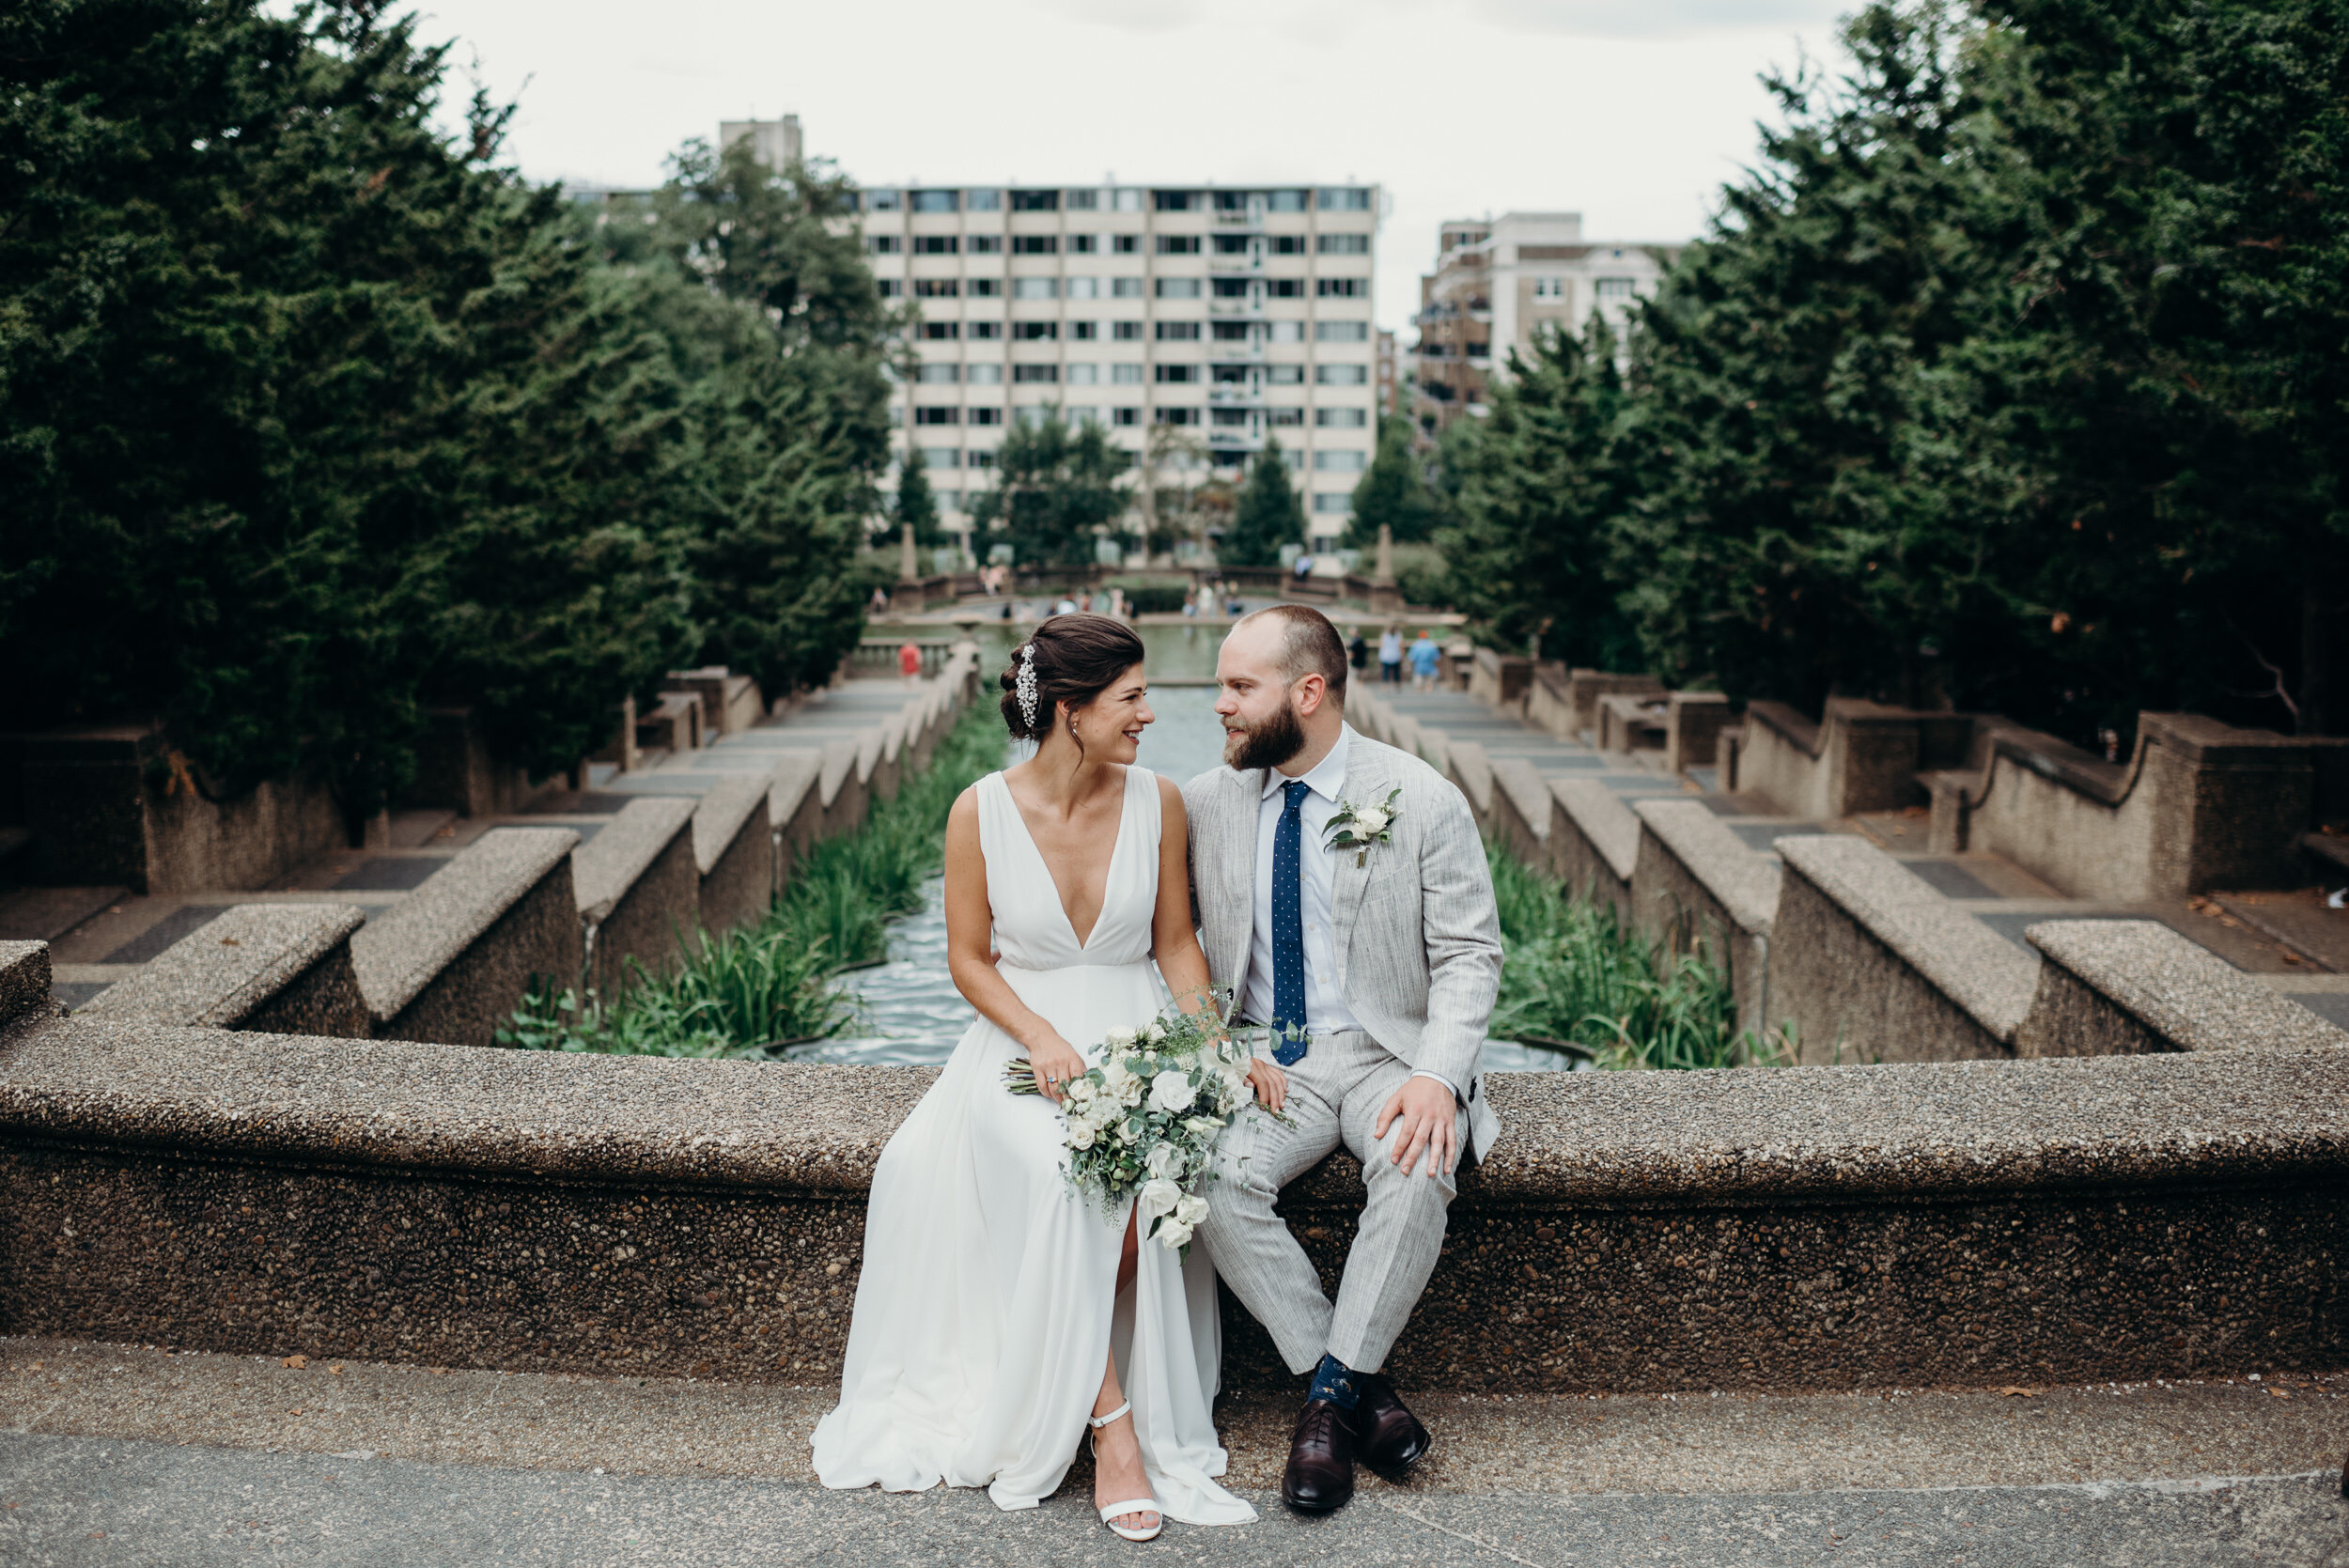 dc-wedding-photographer-the-line-hotel-megan-graham